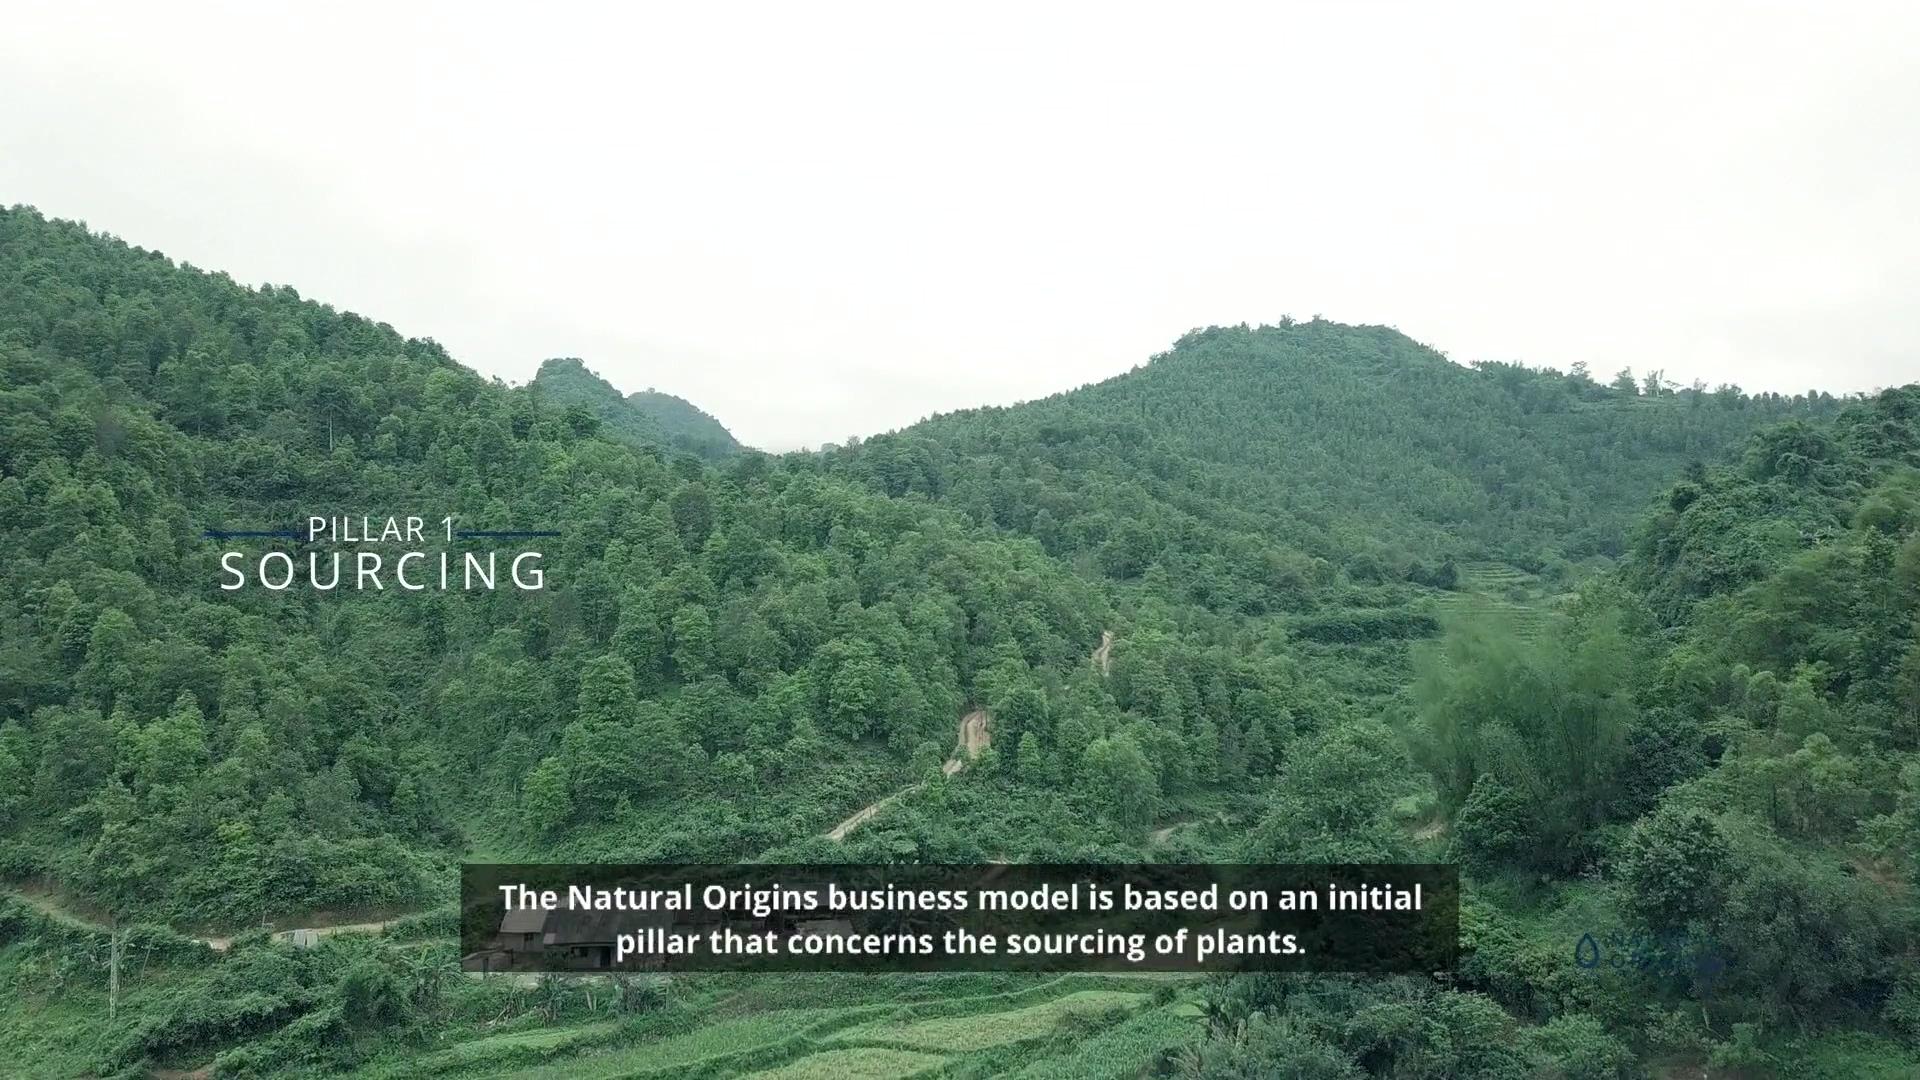 maxime-angelucci-s-interview-natural-origins-pillars